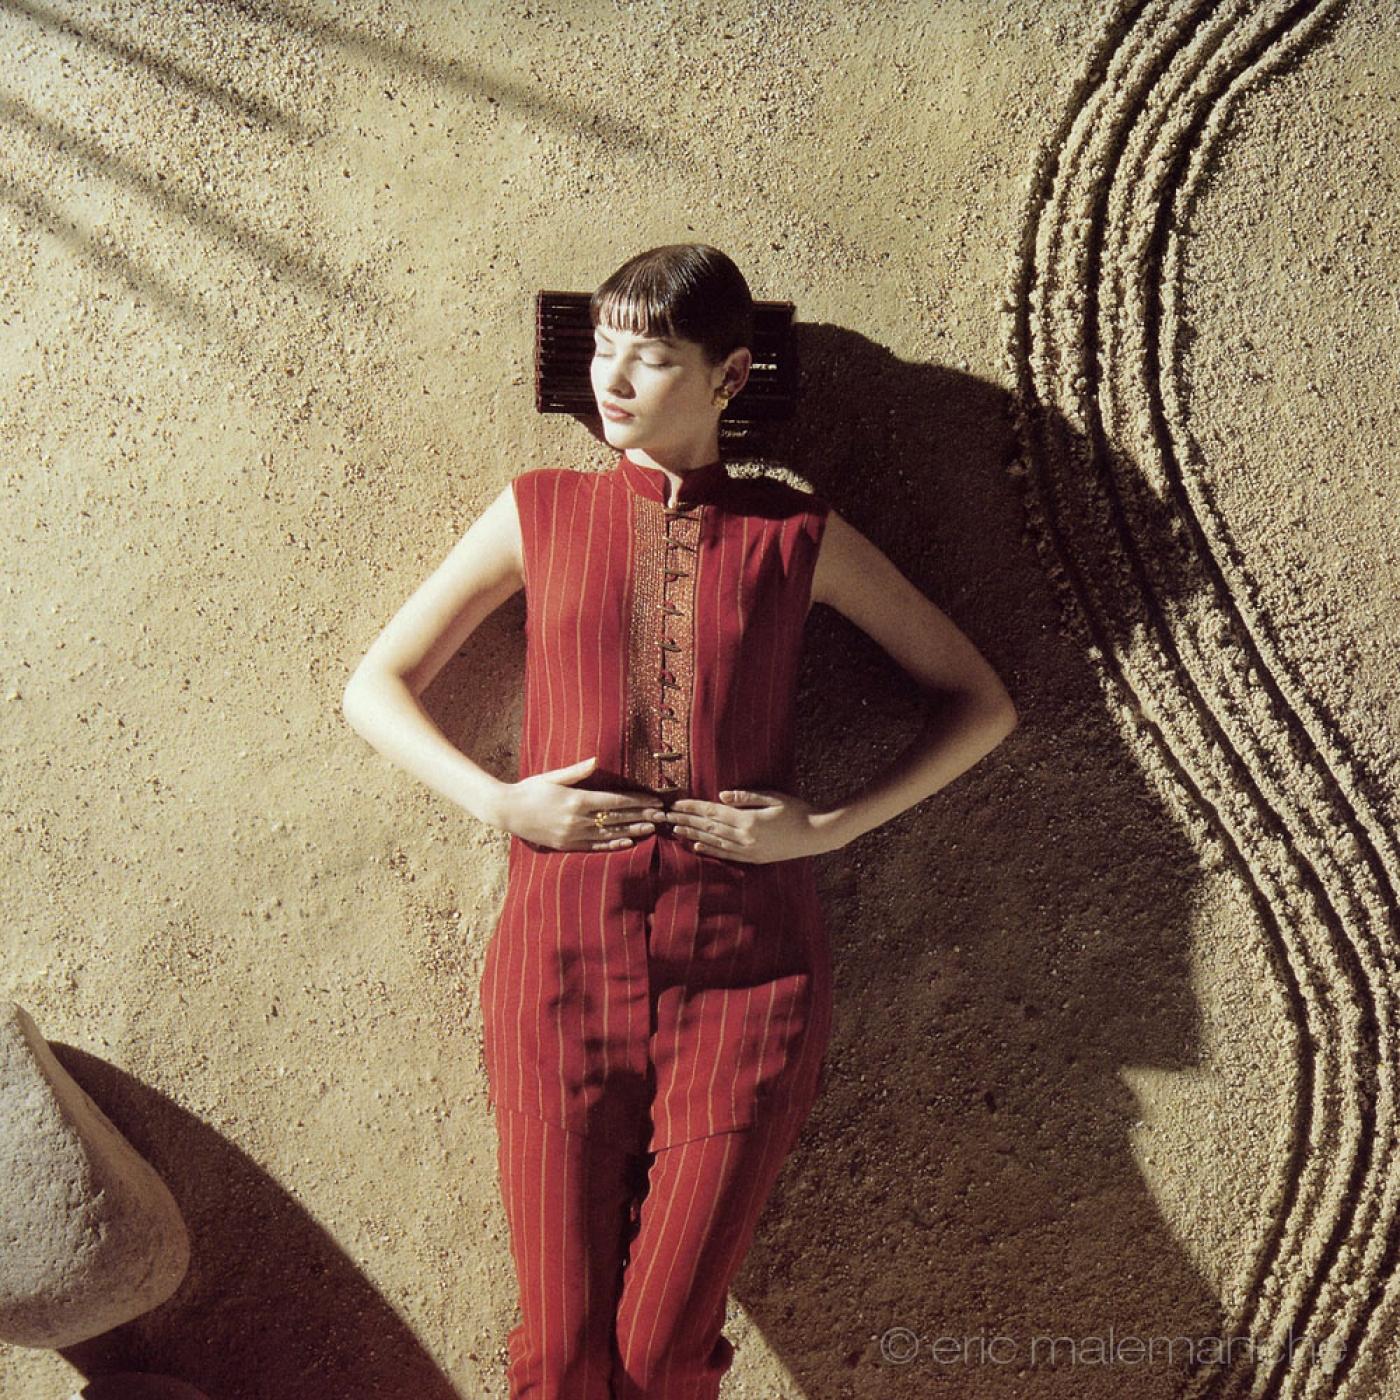 https://www.ericmalemanche.com/imagess/topics/fashion-90-s/liste/Fashion-Malemanche-003.jpg